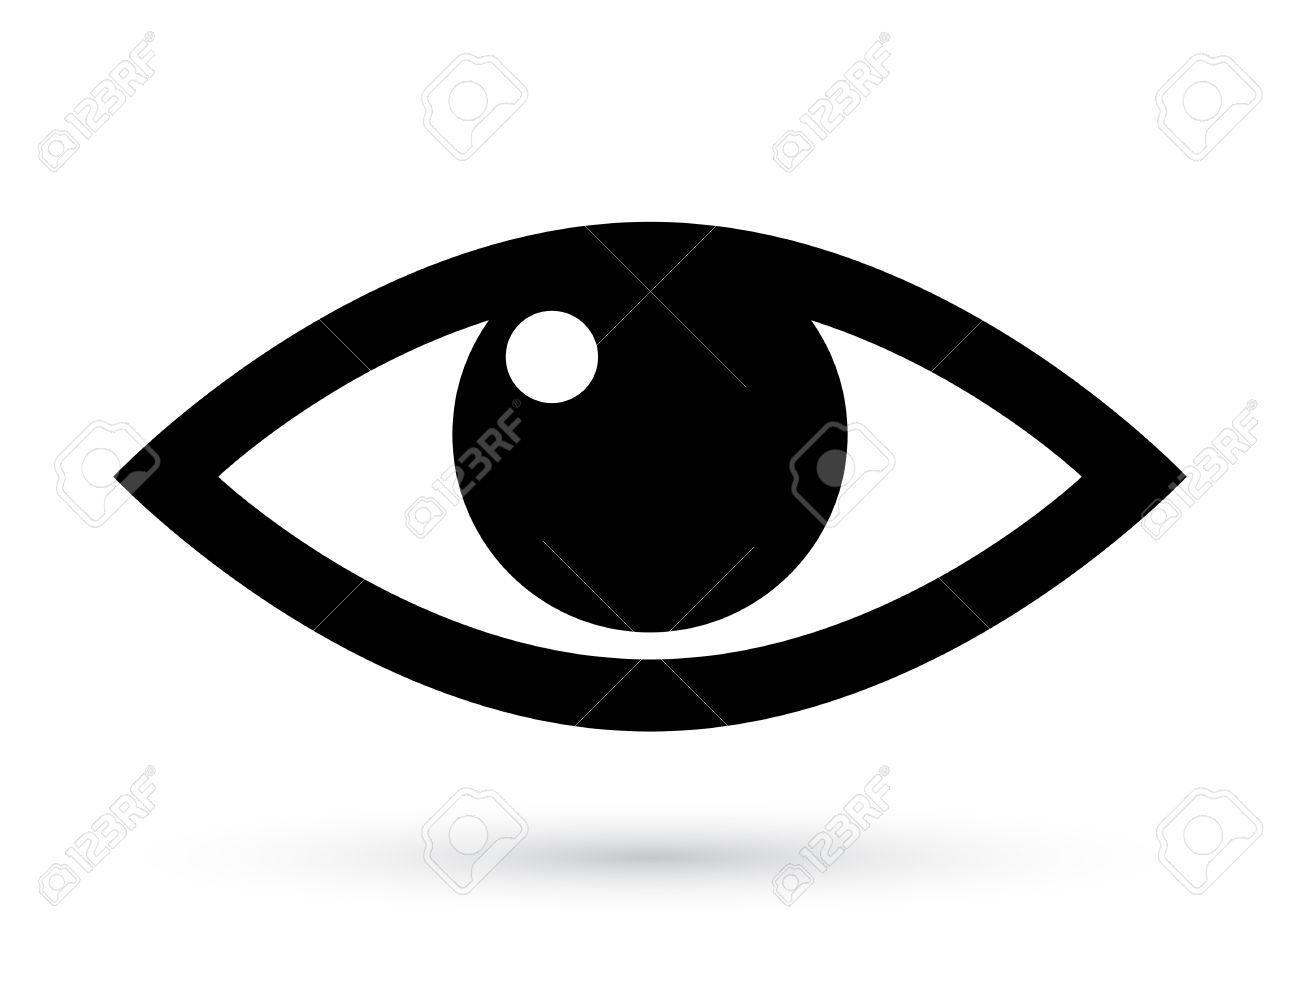 eye vector ideal vistalist co rh ideal vistalist co eye vector icon eye vector eps